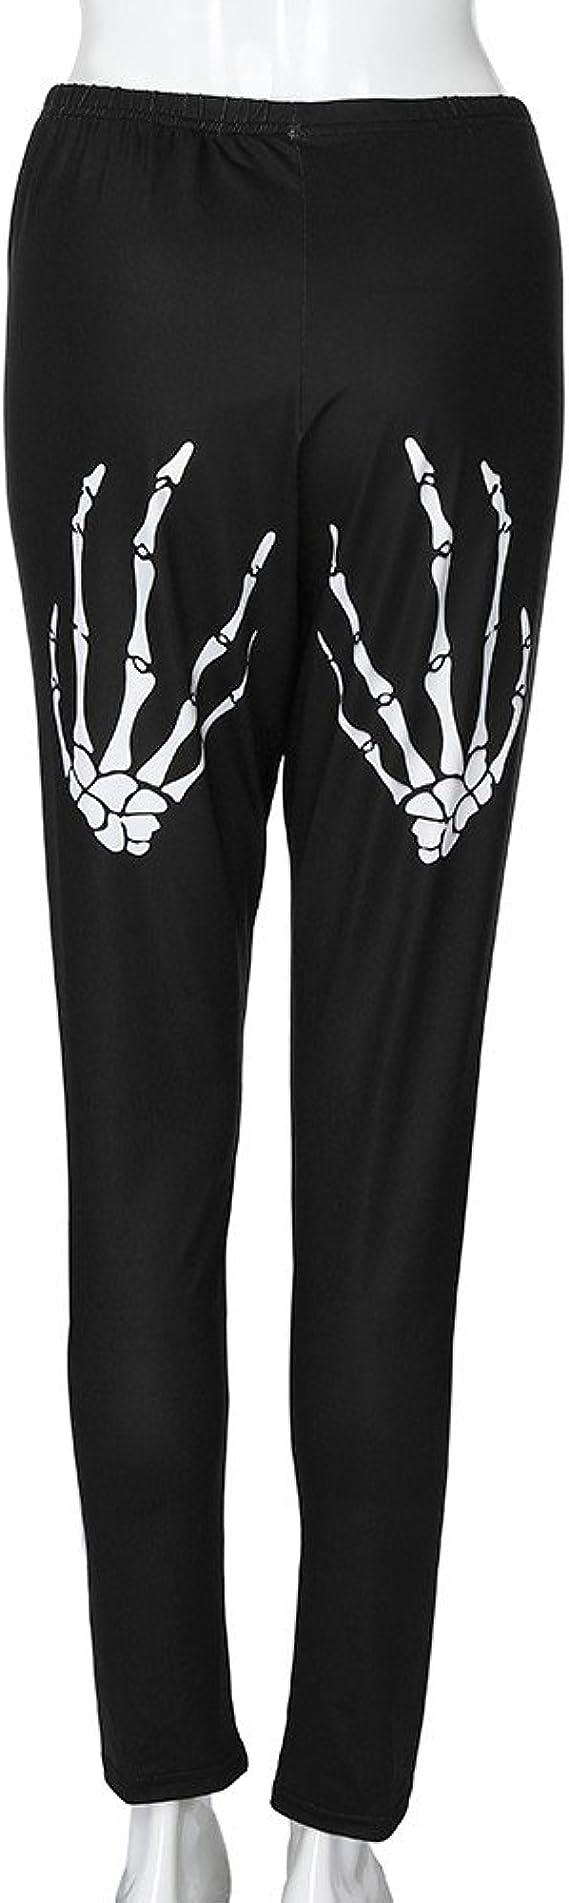 LILICAT Mode Femmes Taille Haute Yoga Sport Pantalon Plus La Taille Shredding Cr/ânes Jambi/ères Mode Cr/âne Trou Grande Taille Pantalons